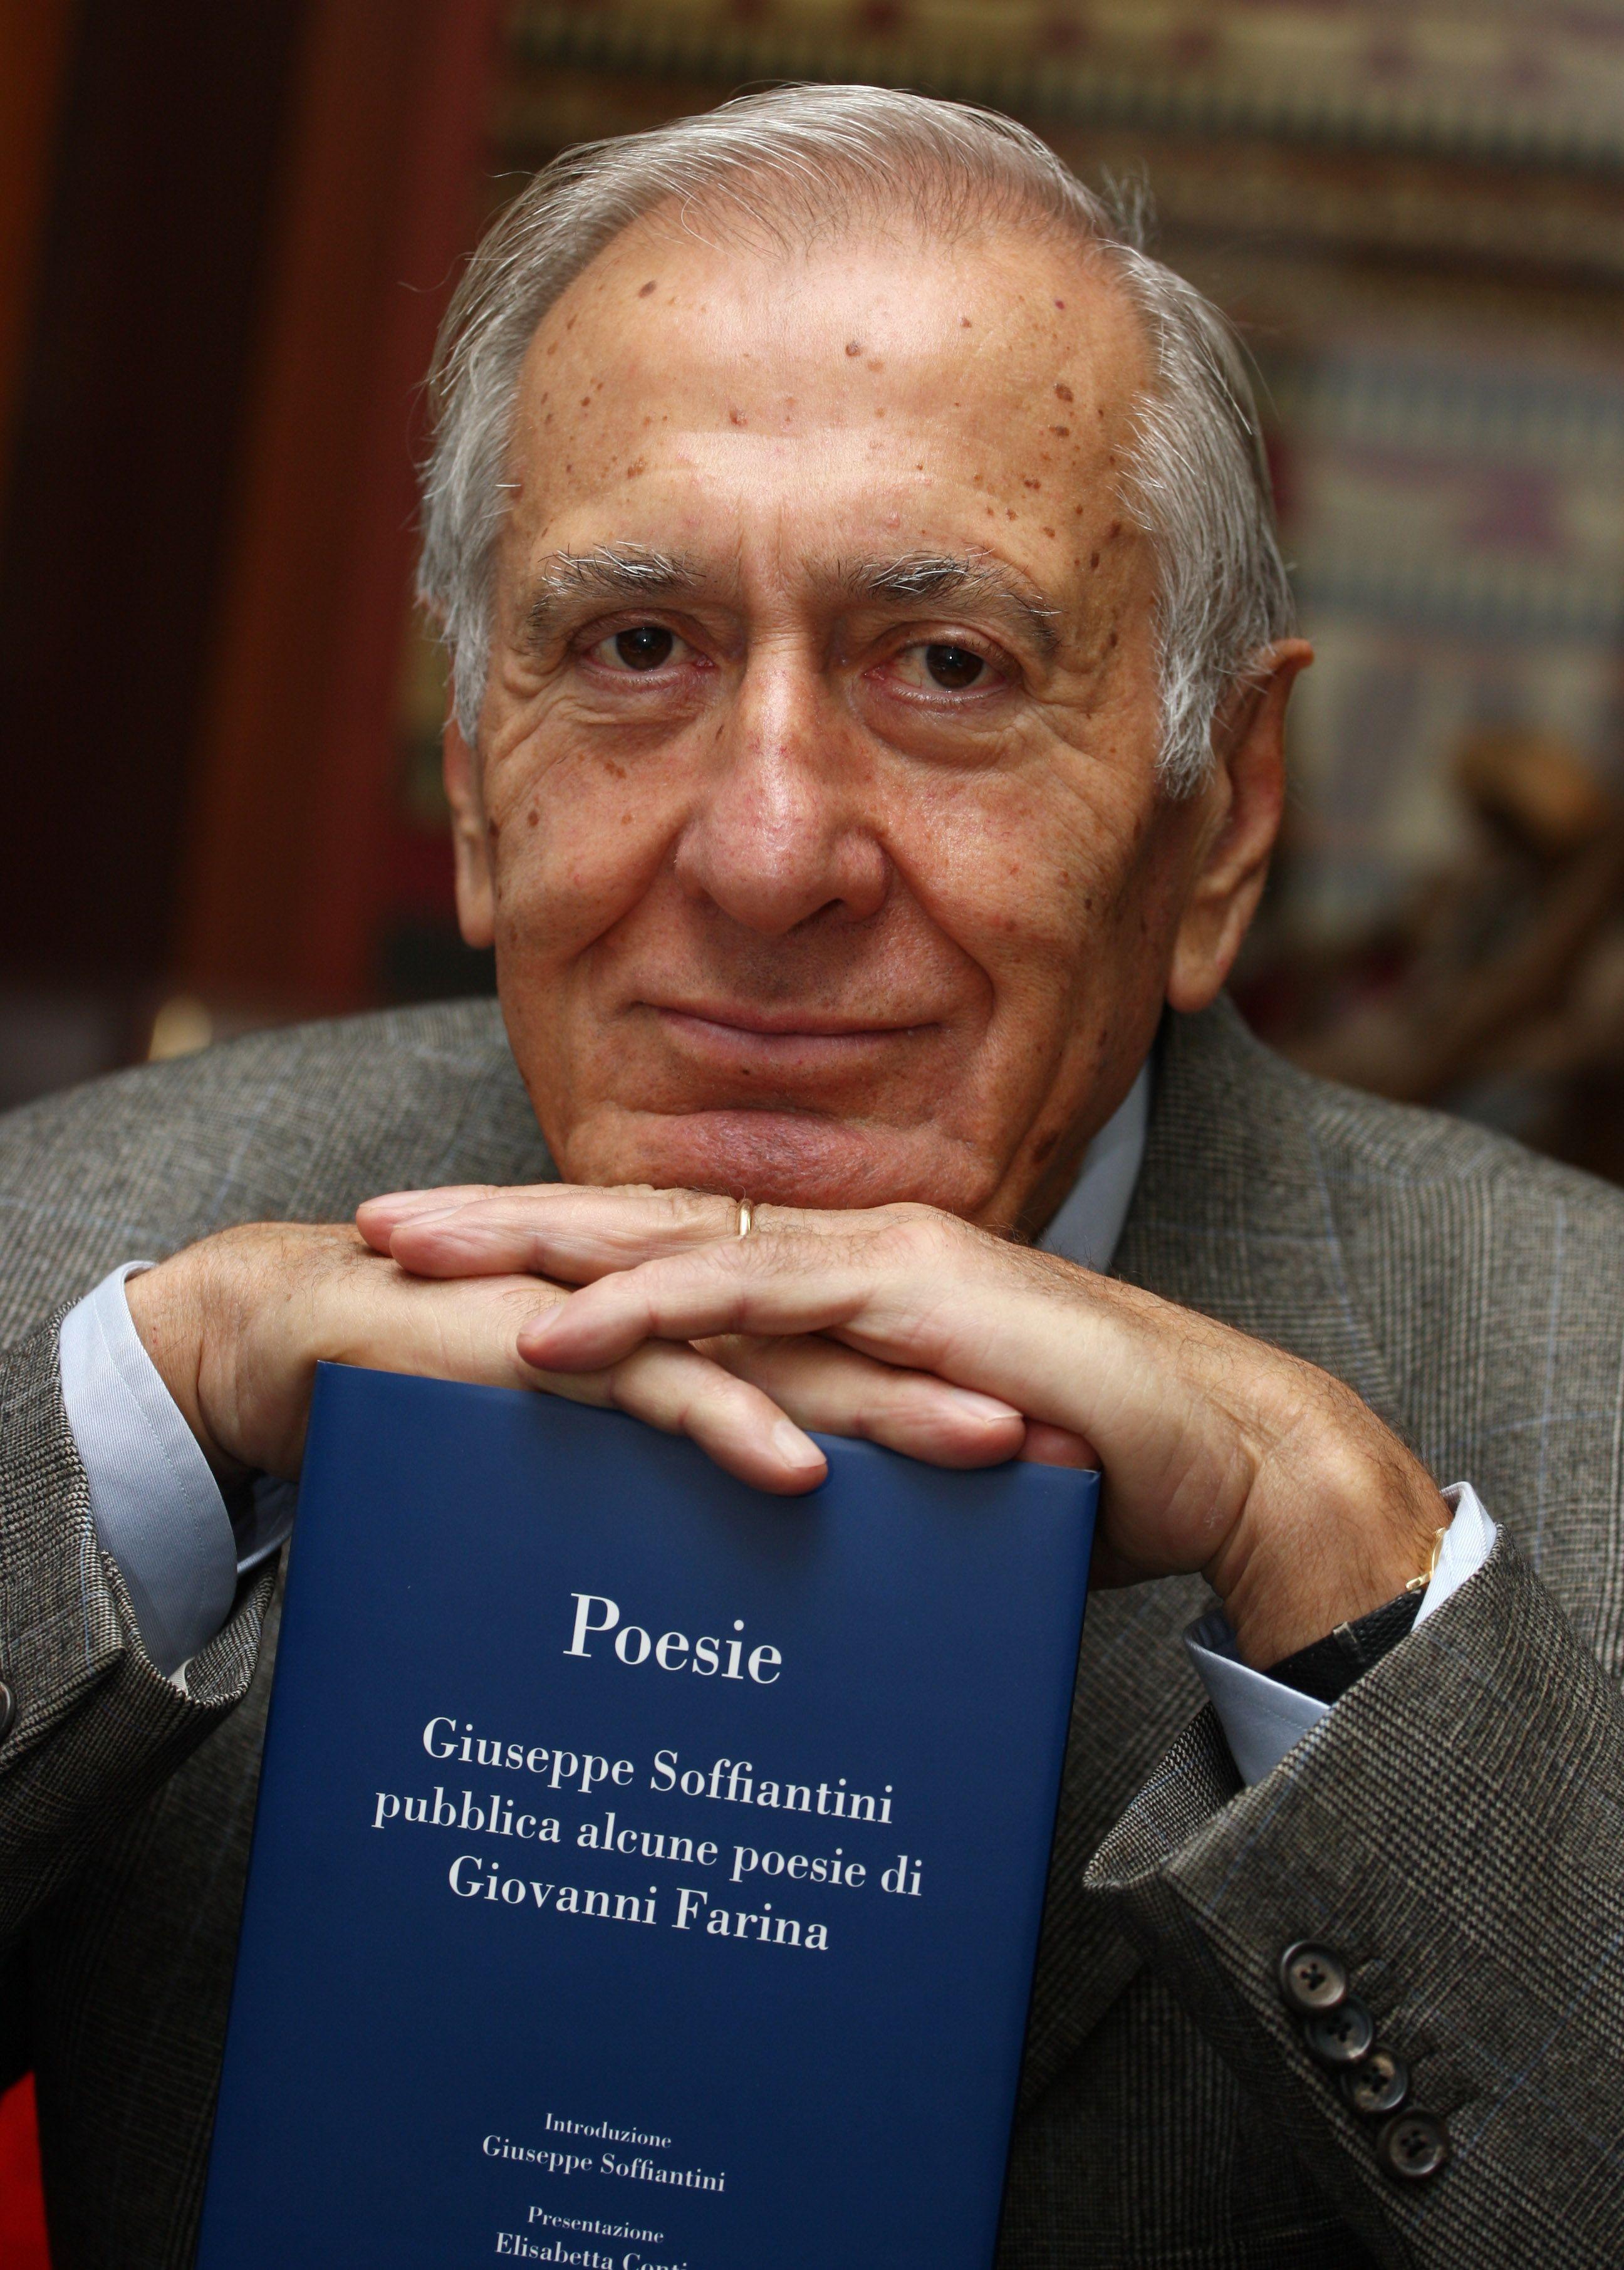 Giuseppe Soffiantini, imprenditore